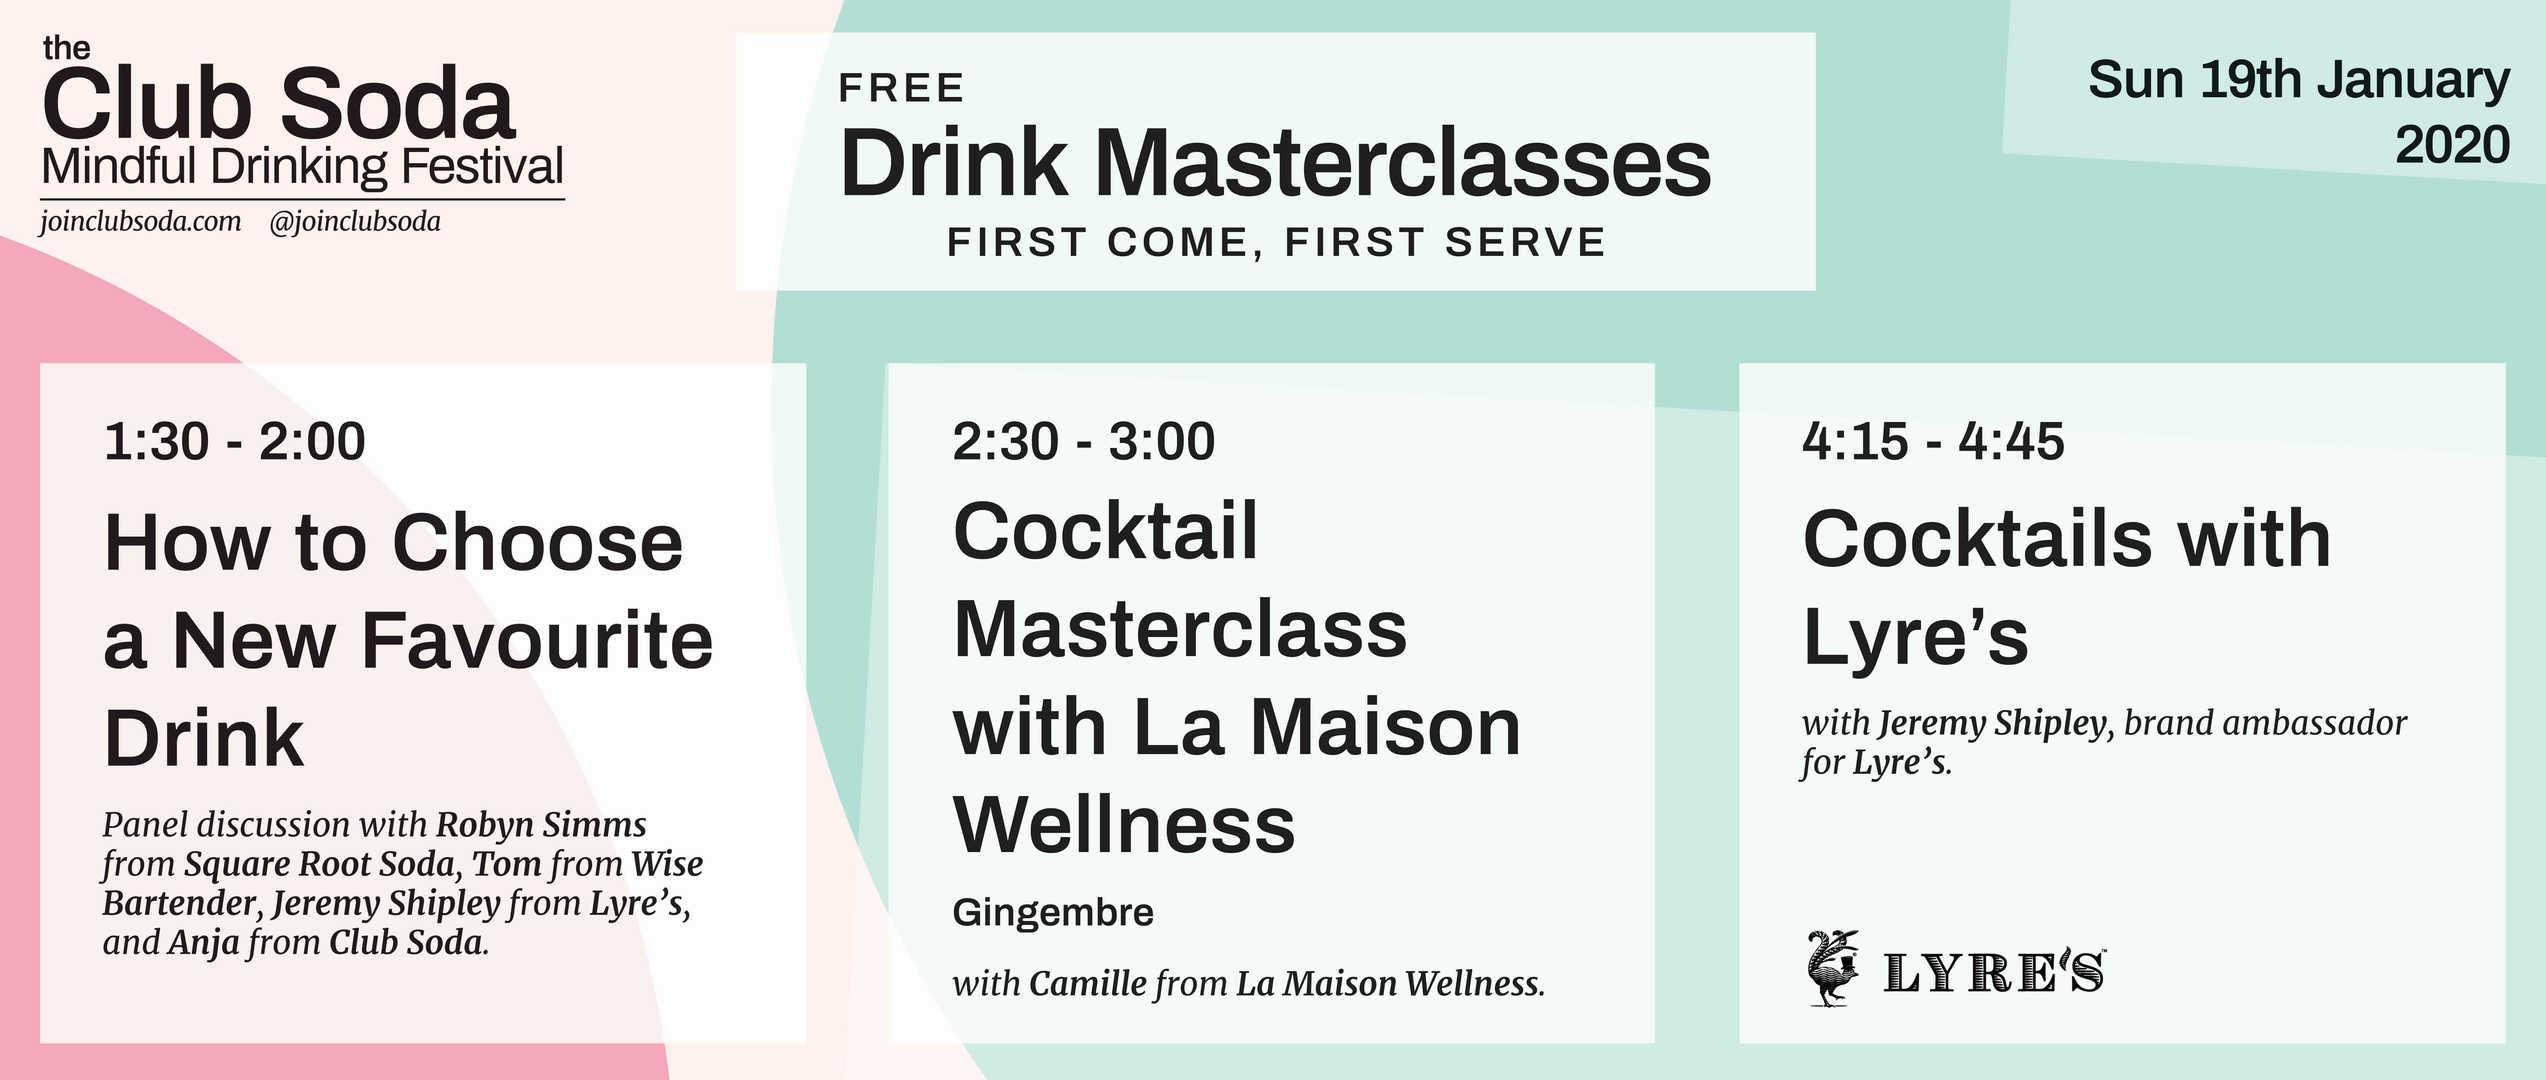 Mindful Drinking Festival Drink Masterclasses Sunday